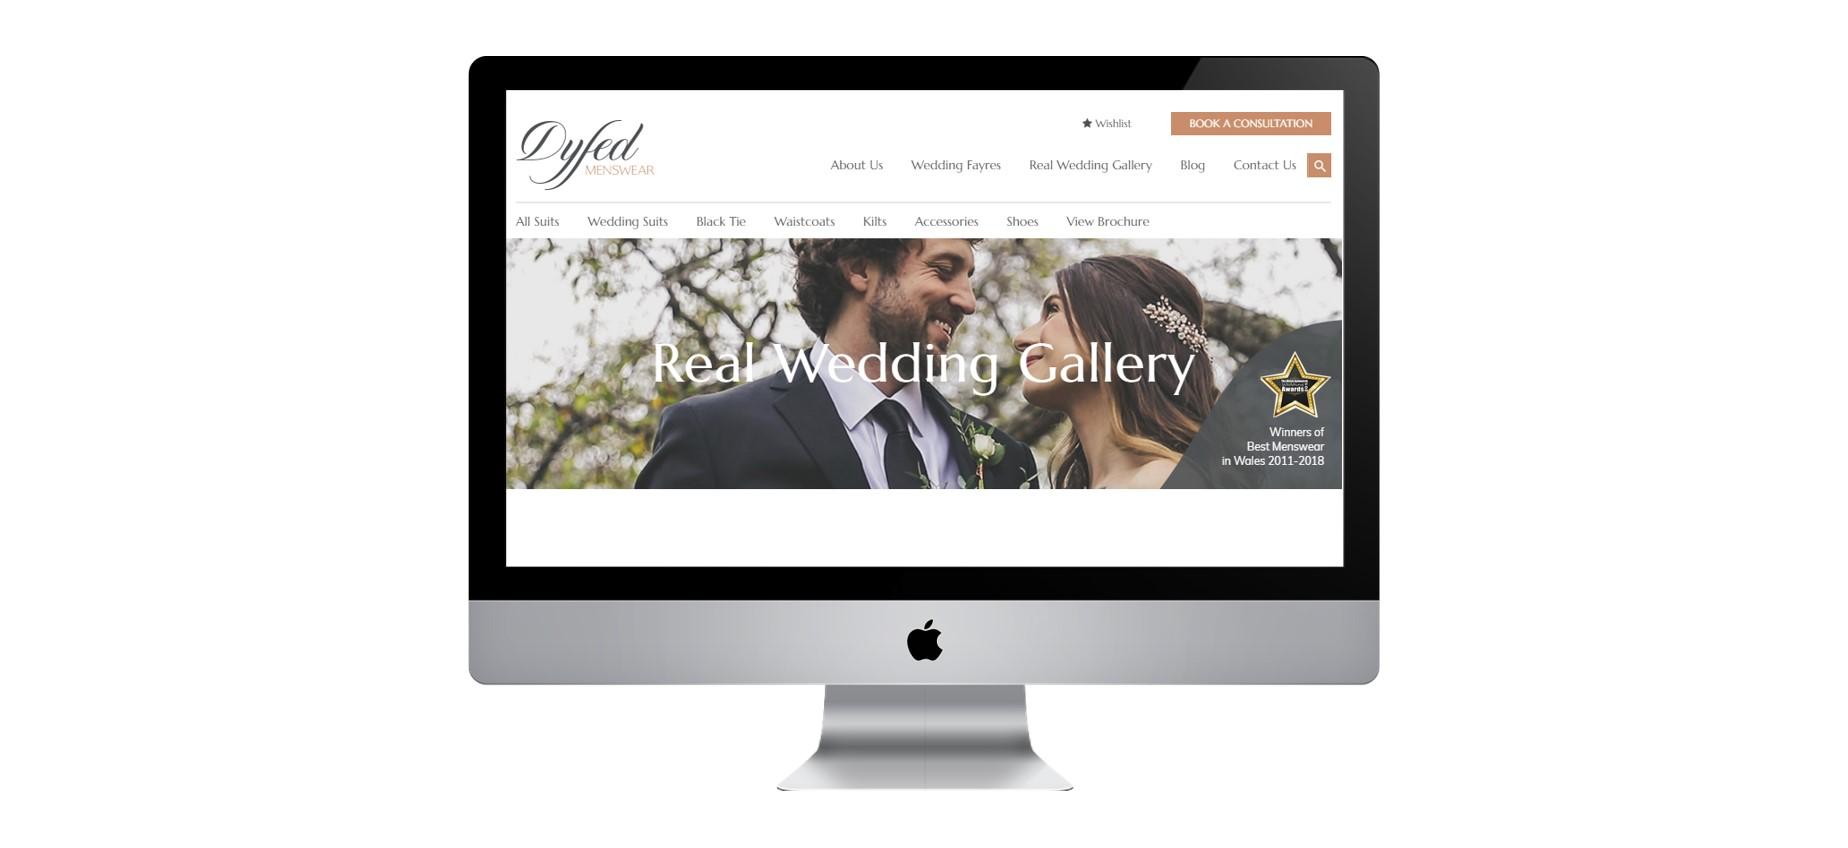 Dyfed Menswear gallery page.